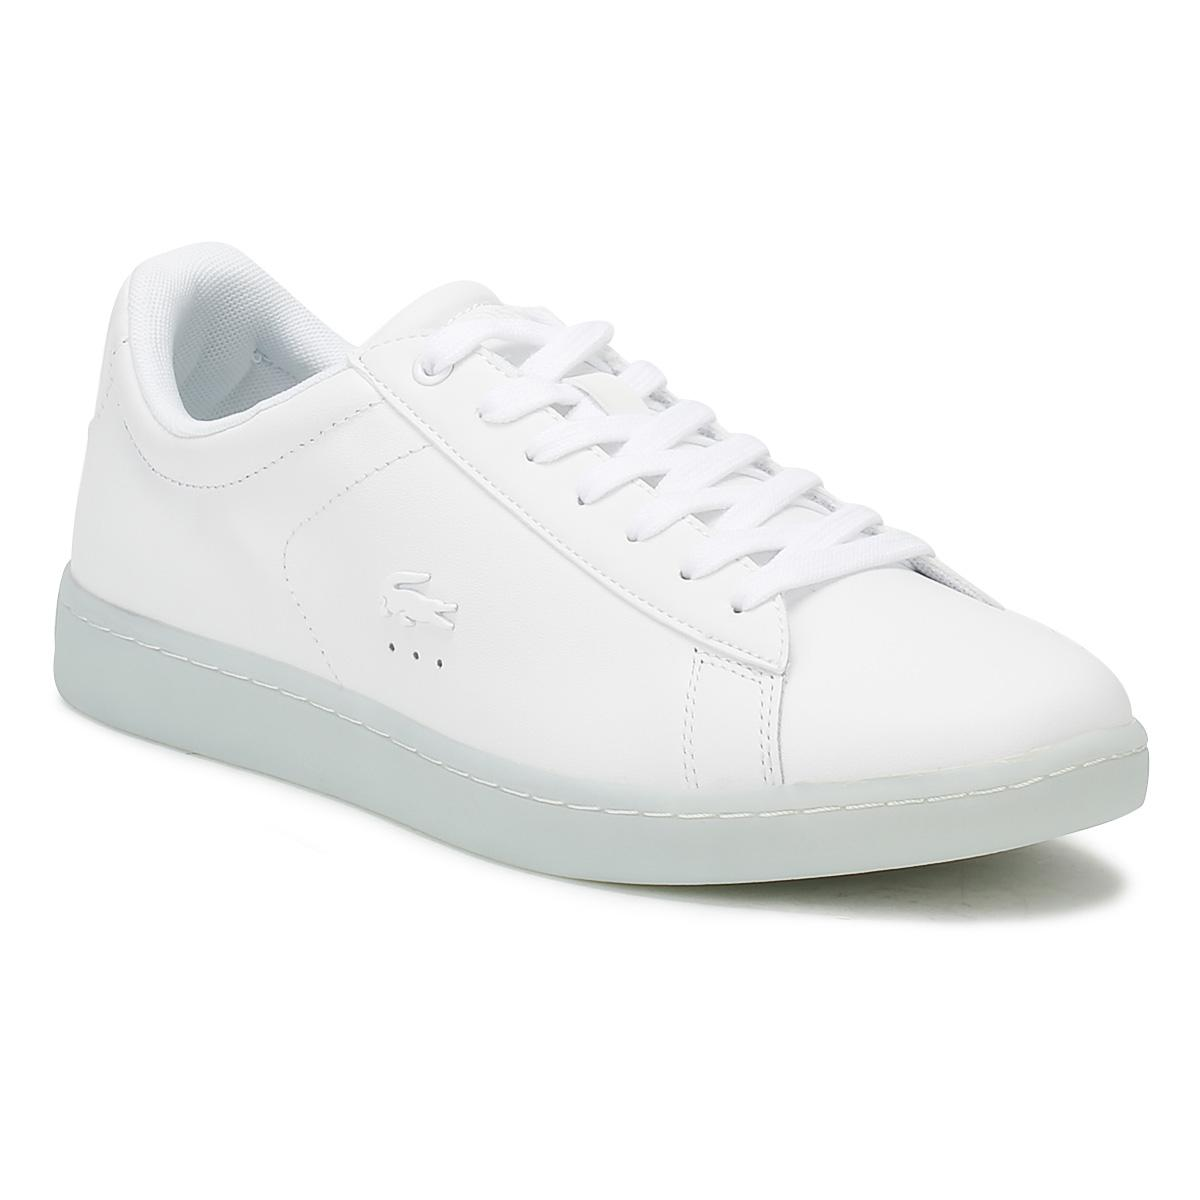 a95b5dc10b206b lacoste-White-Womens-White-Light-Blue-Carnaby-Evo-118-3-Trainers.jpeg